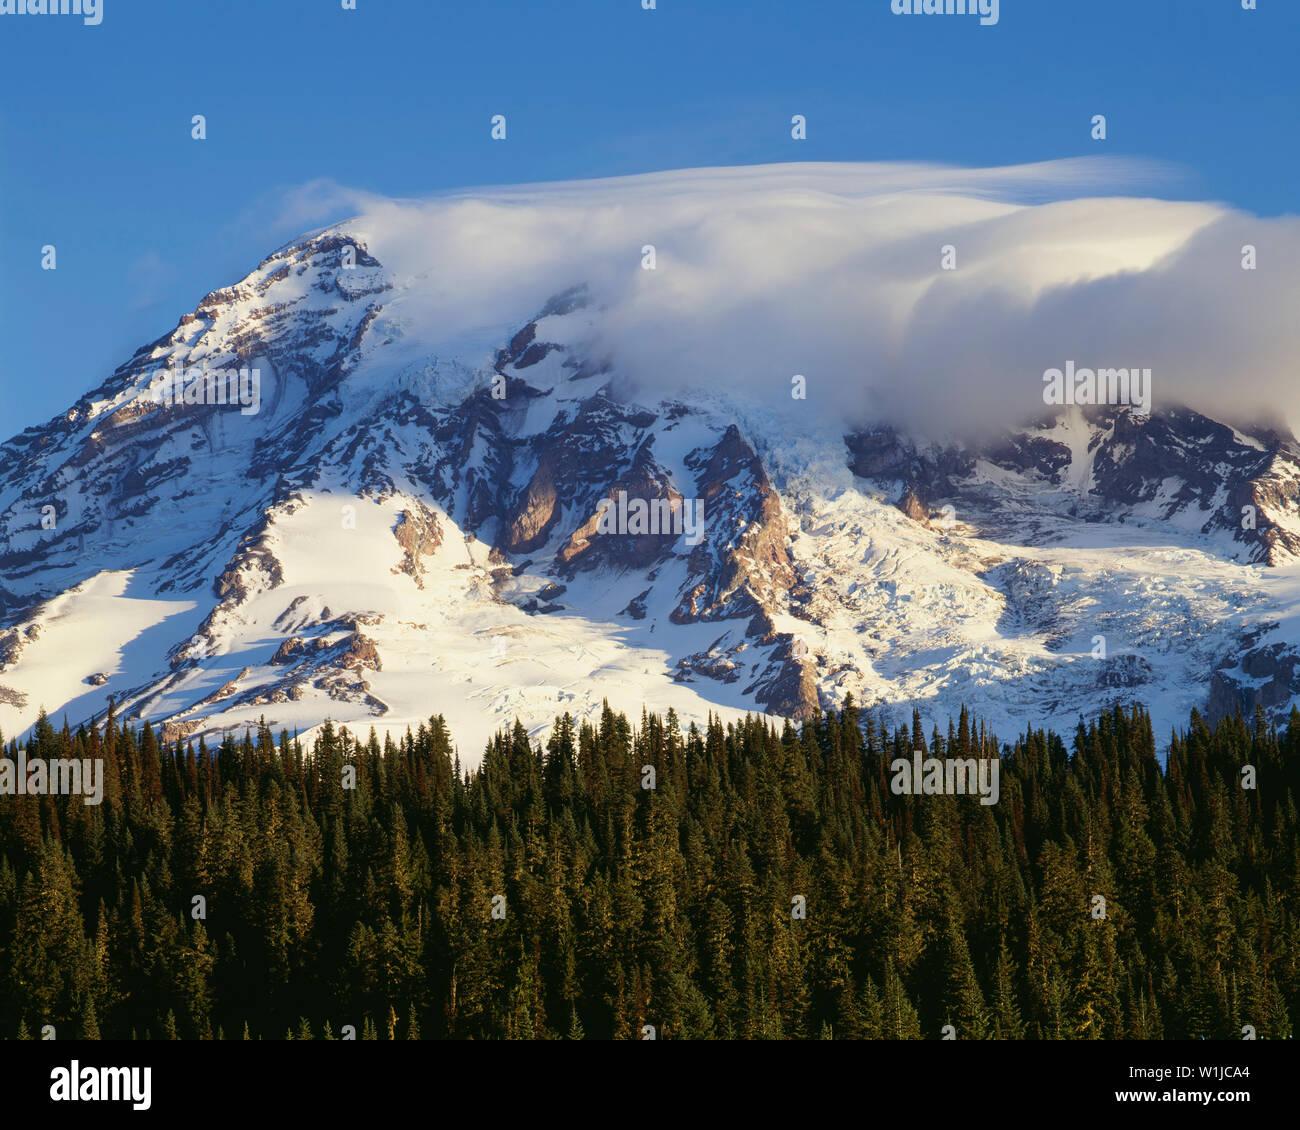 USA, Washington, Mt. Rainier National Park, Morning clouds shroud summit of Mt. Rainier above evergreen forest. - Stock Image